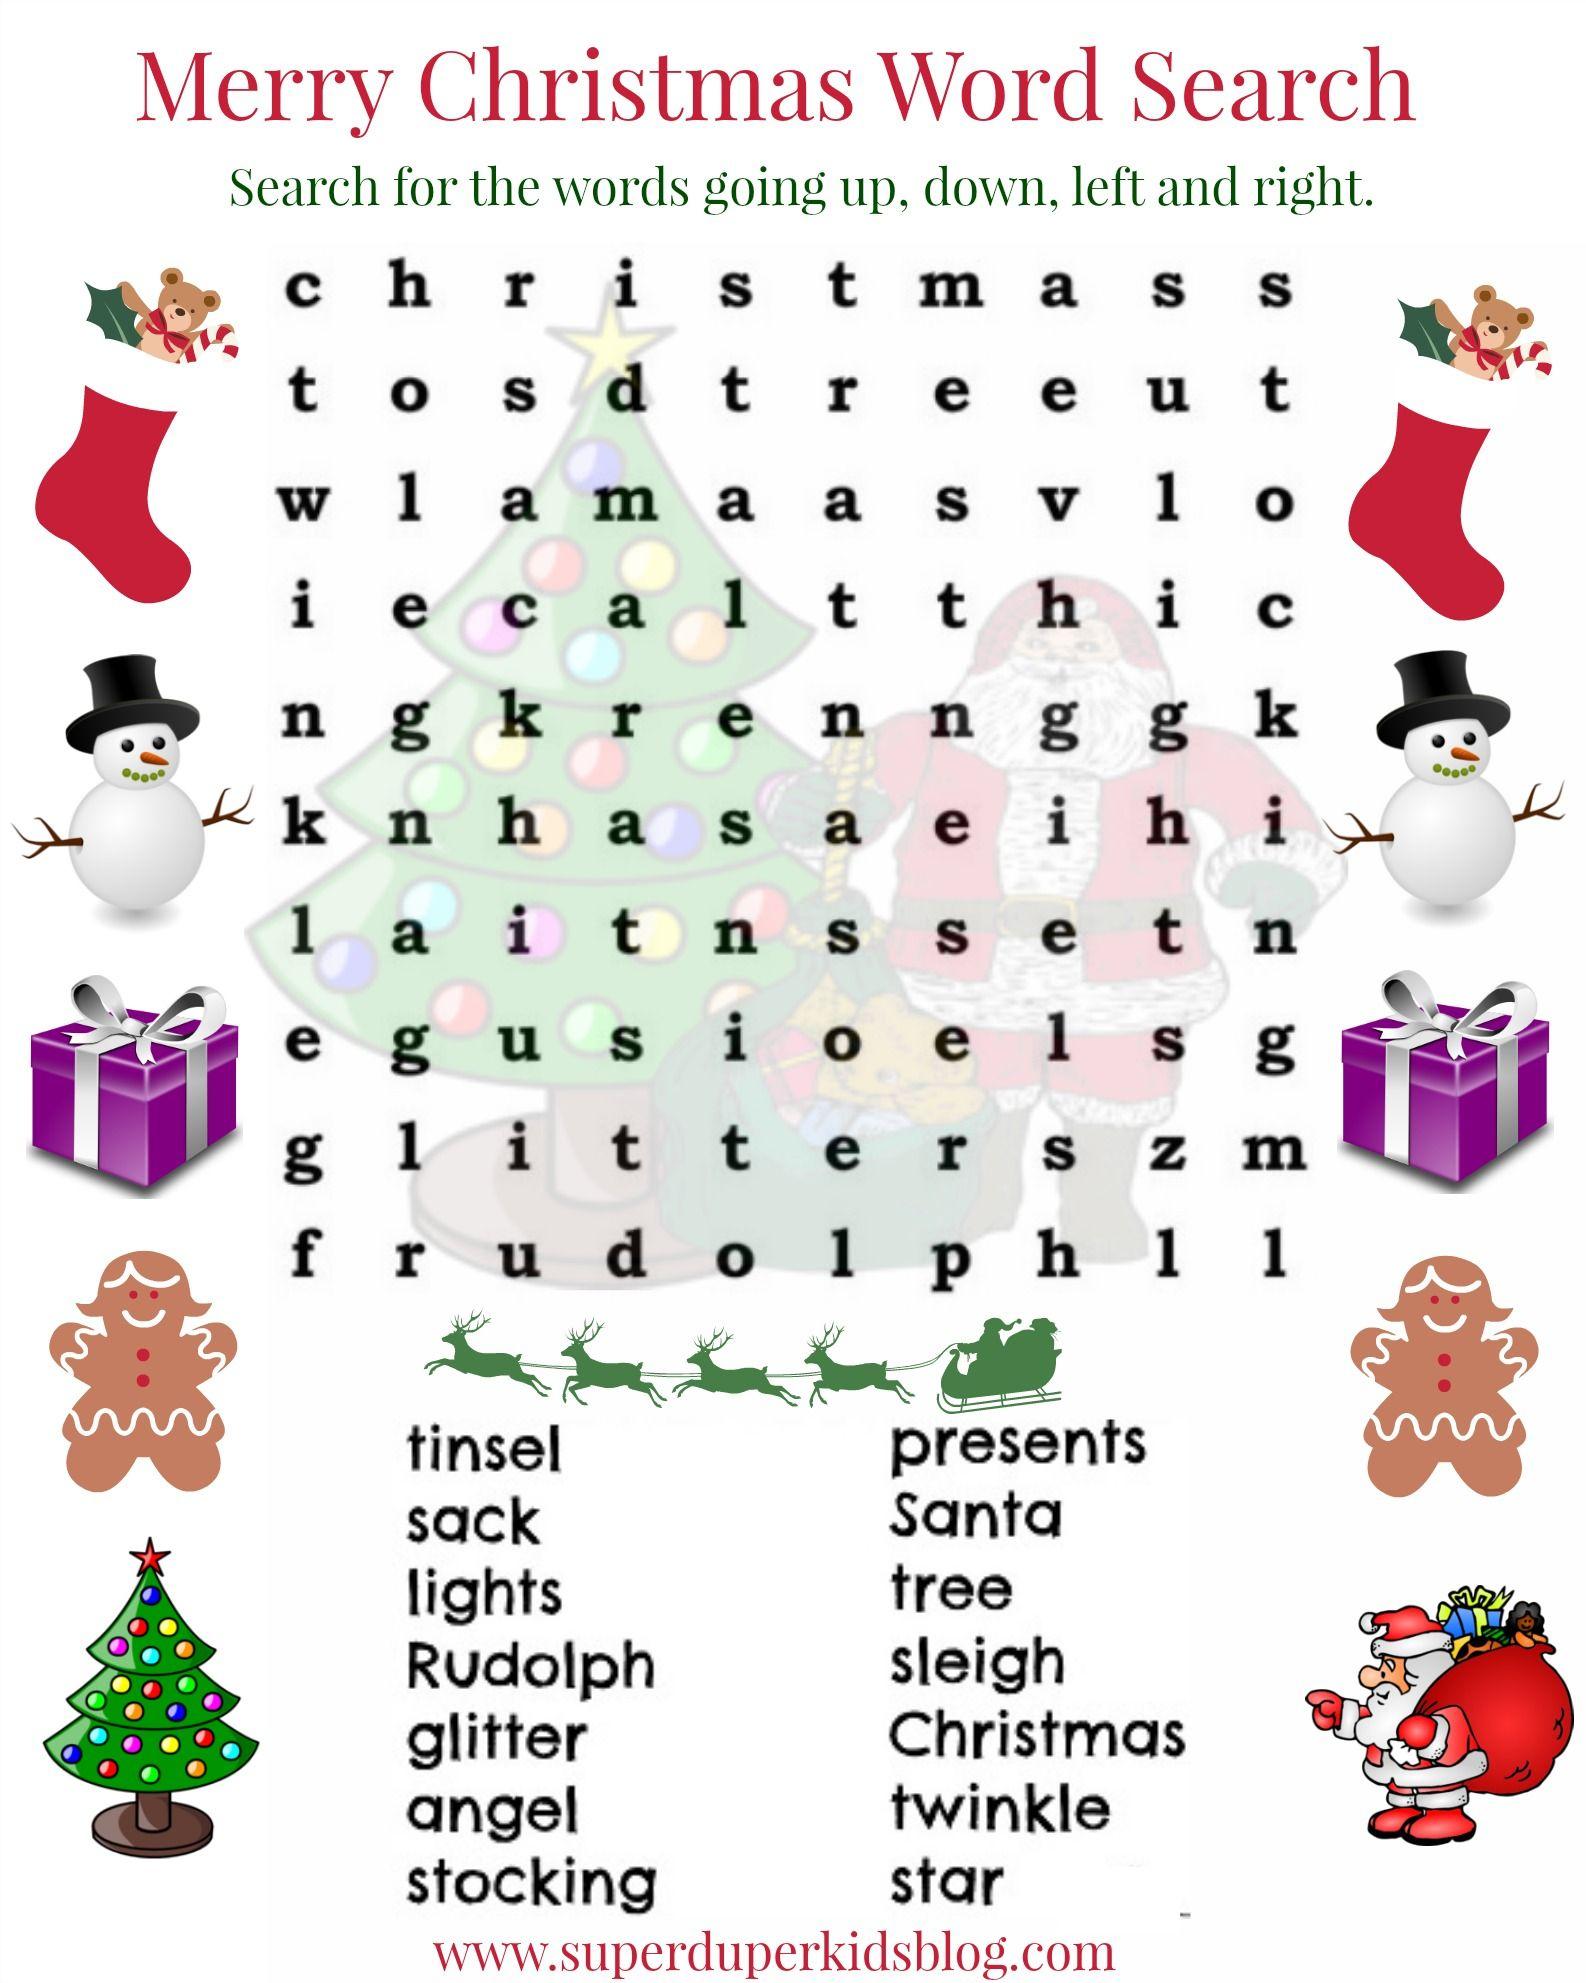 Pinsuperduperkidsblog On Free Printables | Pinterest | Christmas - Free Printable Christmas Word Search